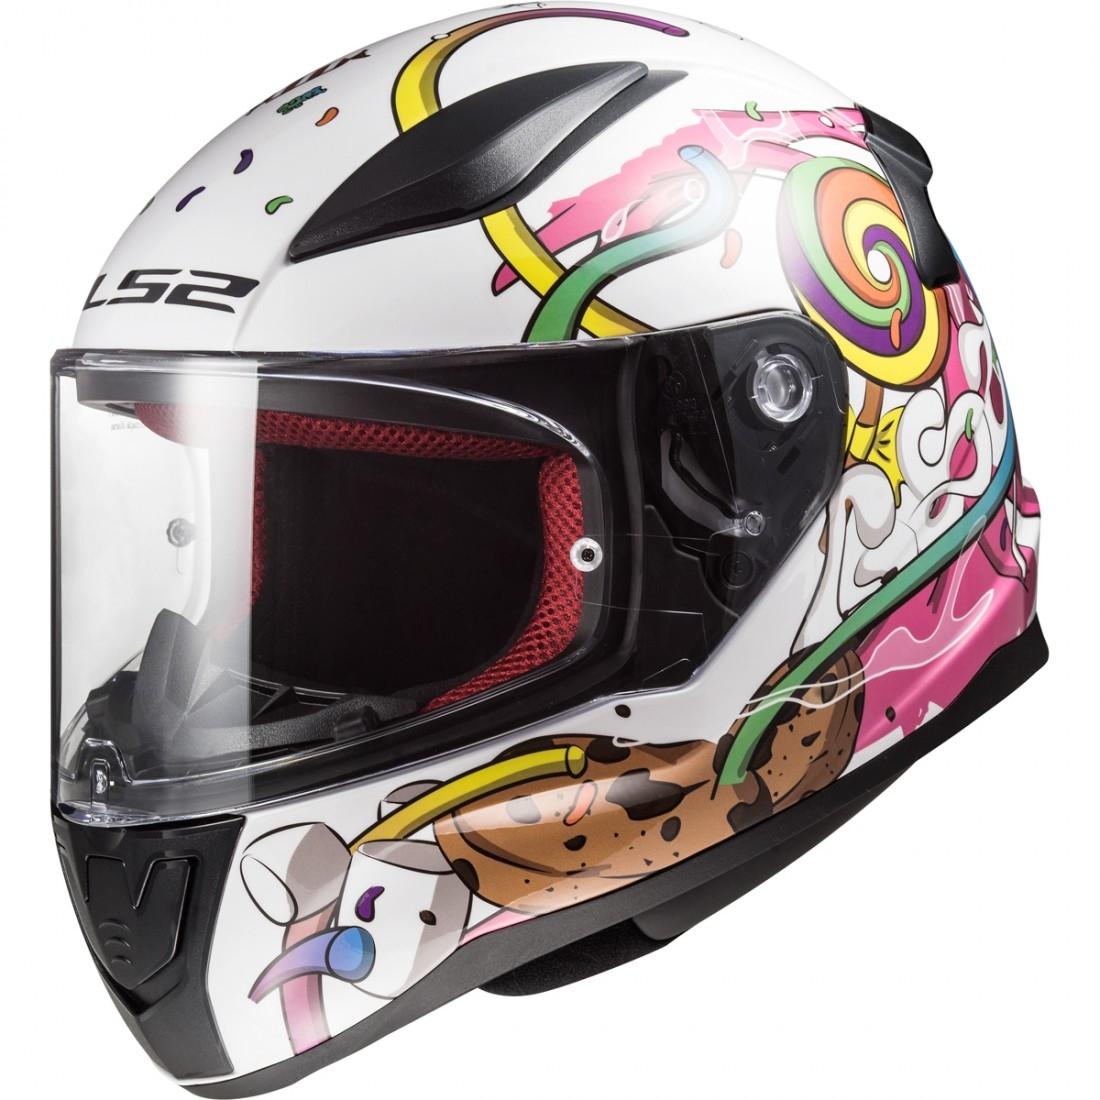 Ls2 Ff353j Rapid Mini Crazy Pop White Pink Helmet